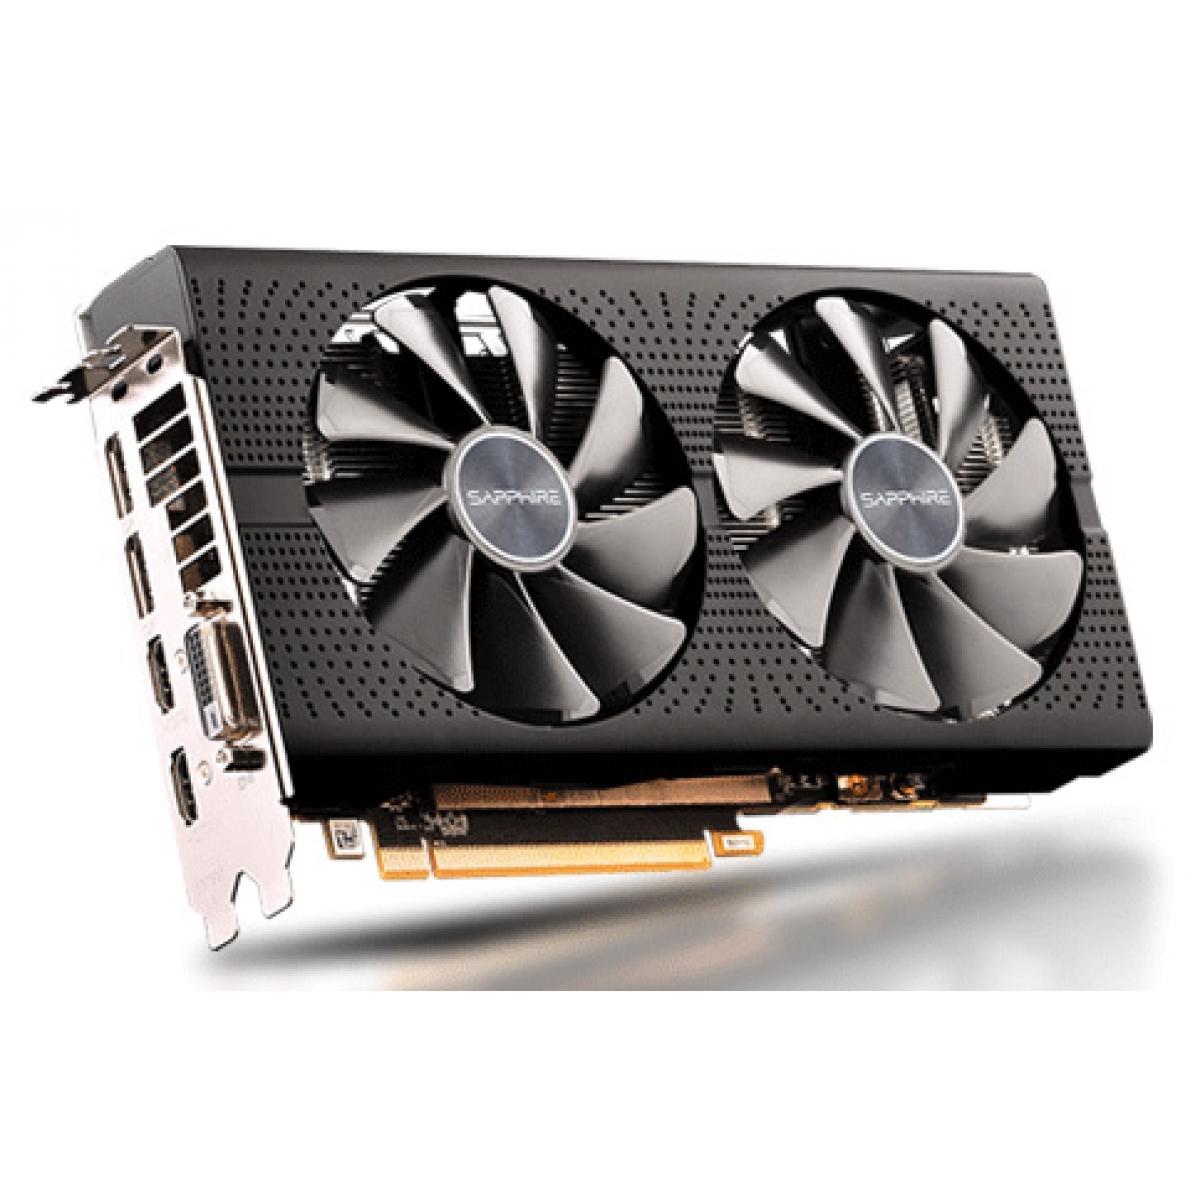 Placa de Vídeo Sapphire Radeon RX 590 Pulse Dual, 8GB GDDR5, 256BIT